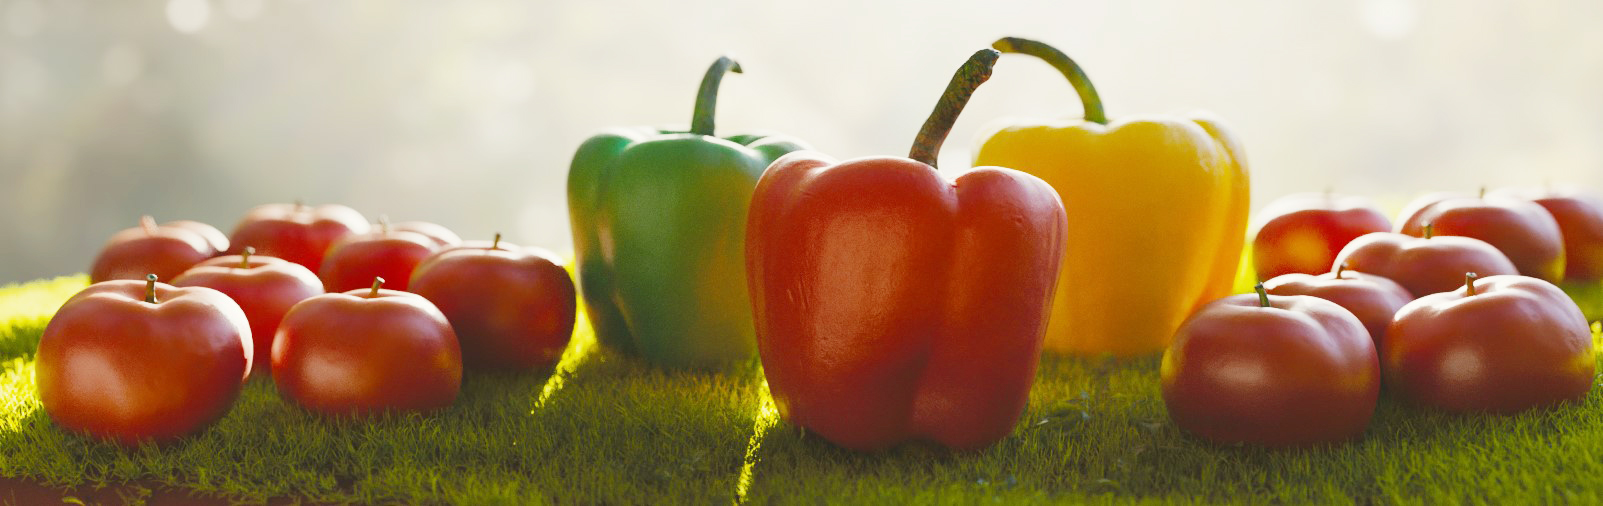 peperoni e pomodori